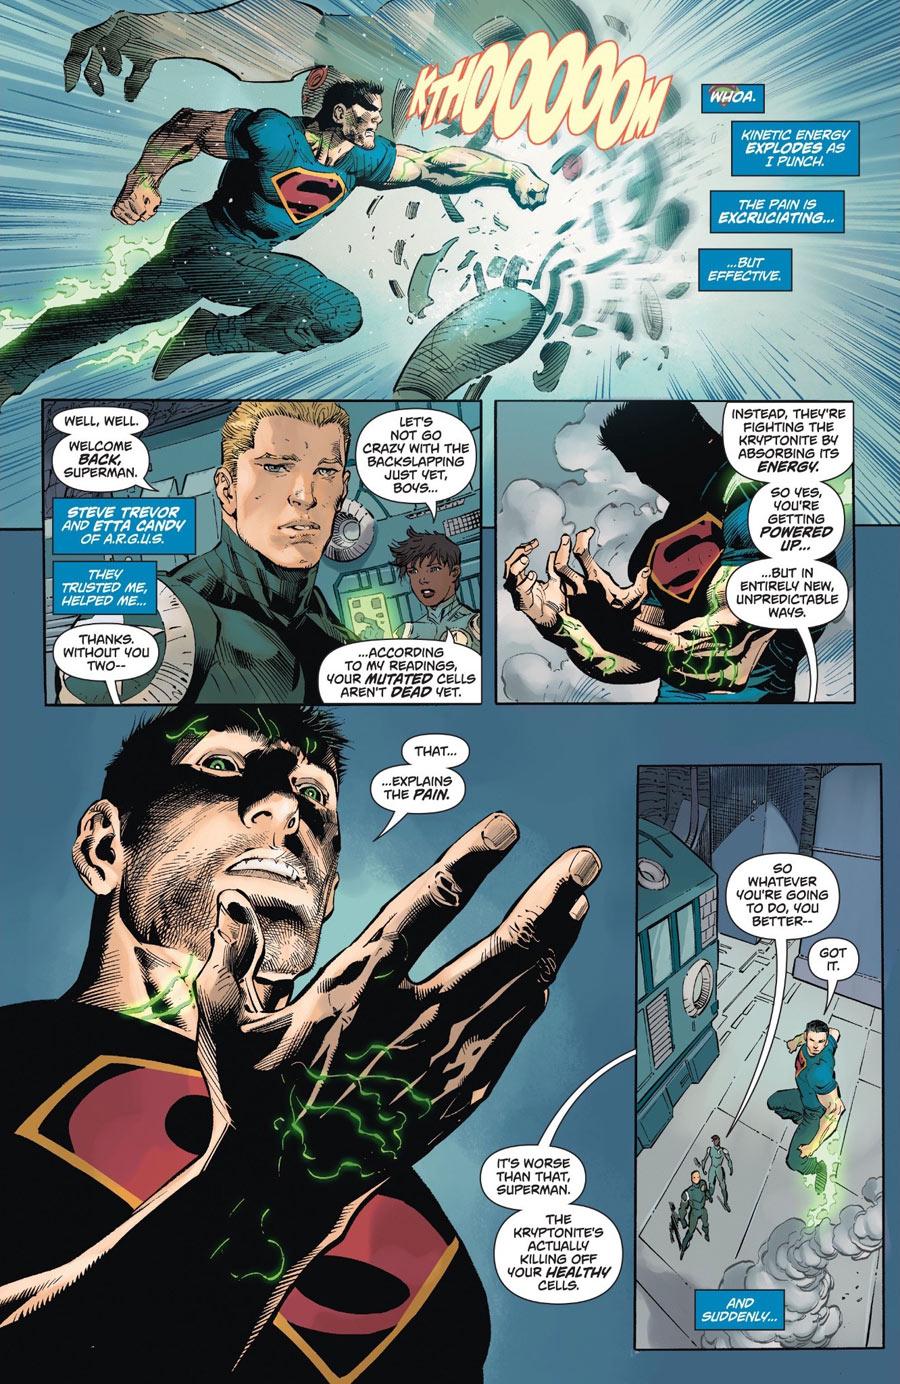 Superman nuevo superpoder 01